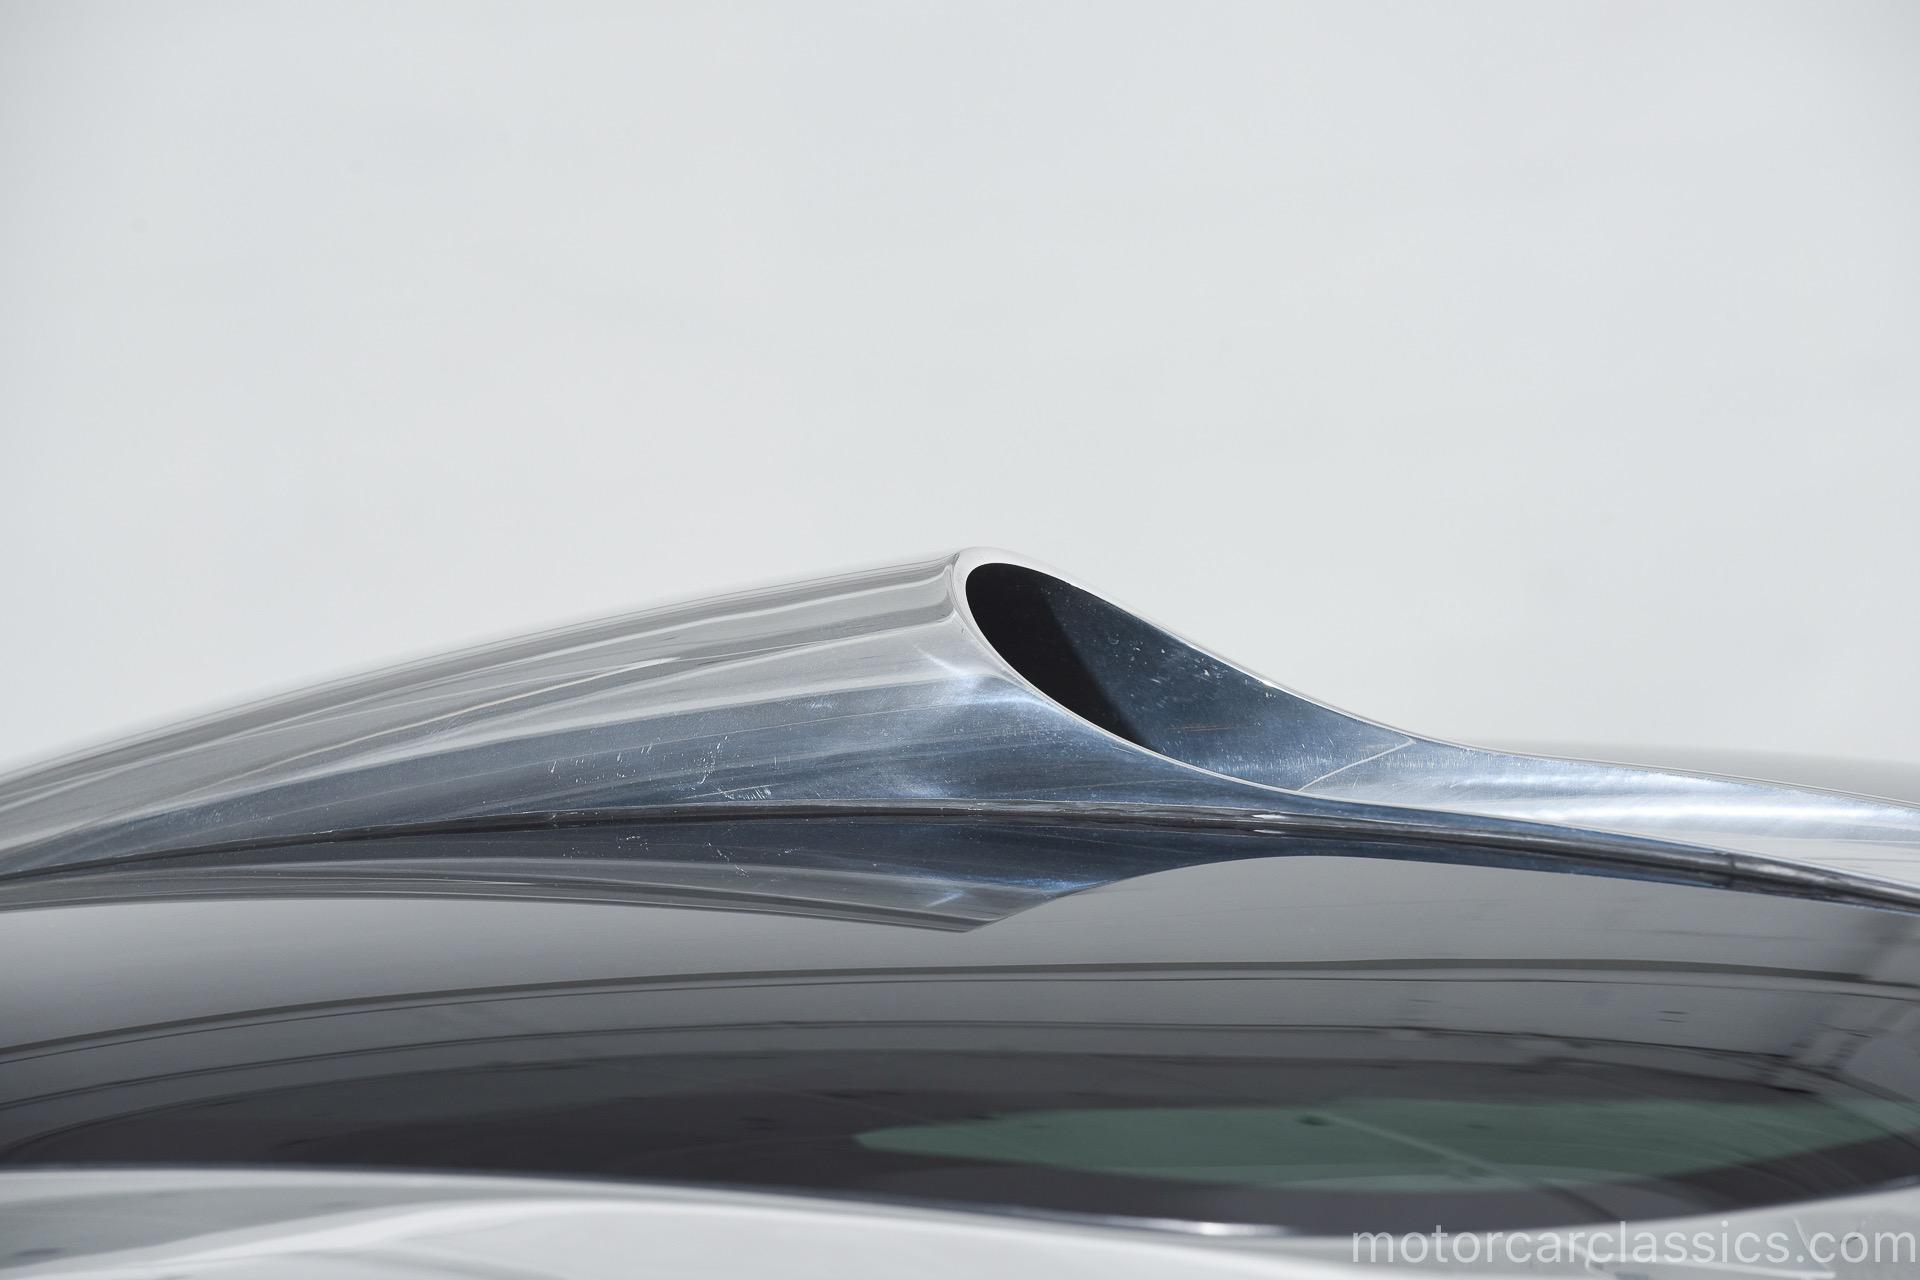 2010 Spyker C8 Laviolette